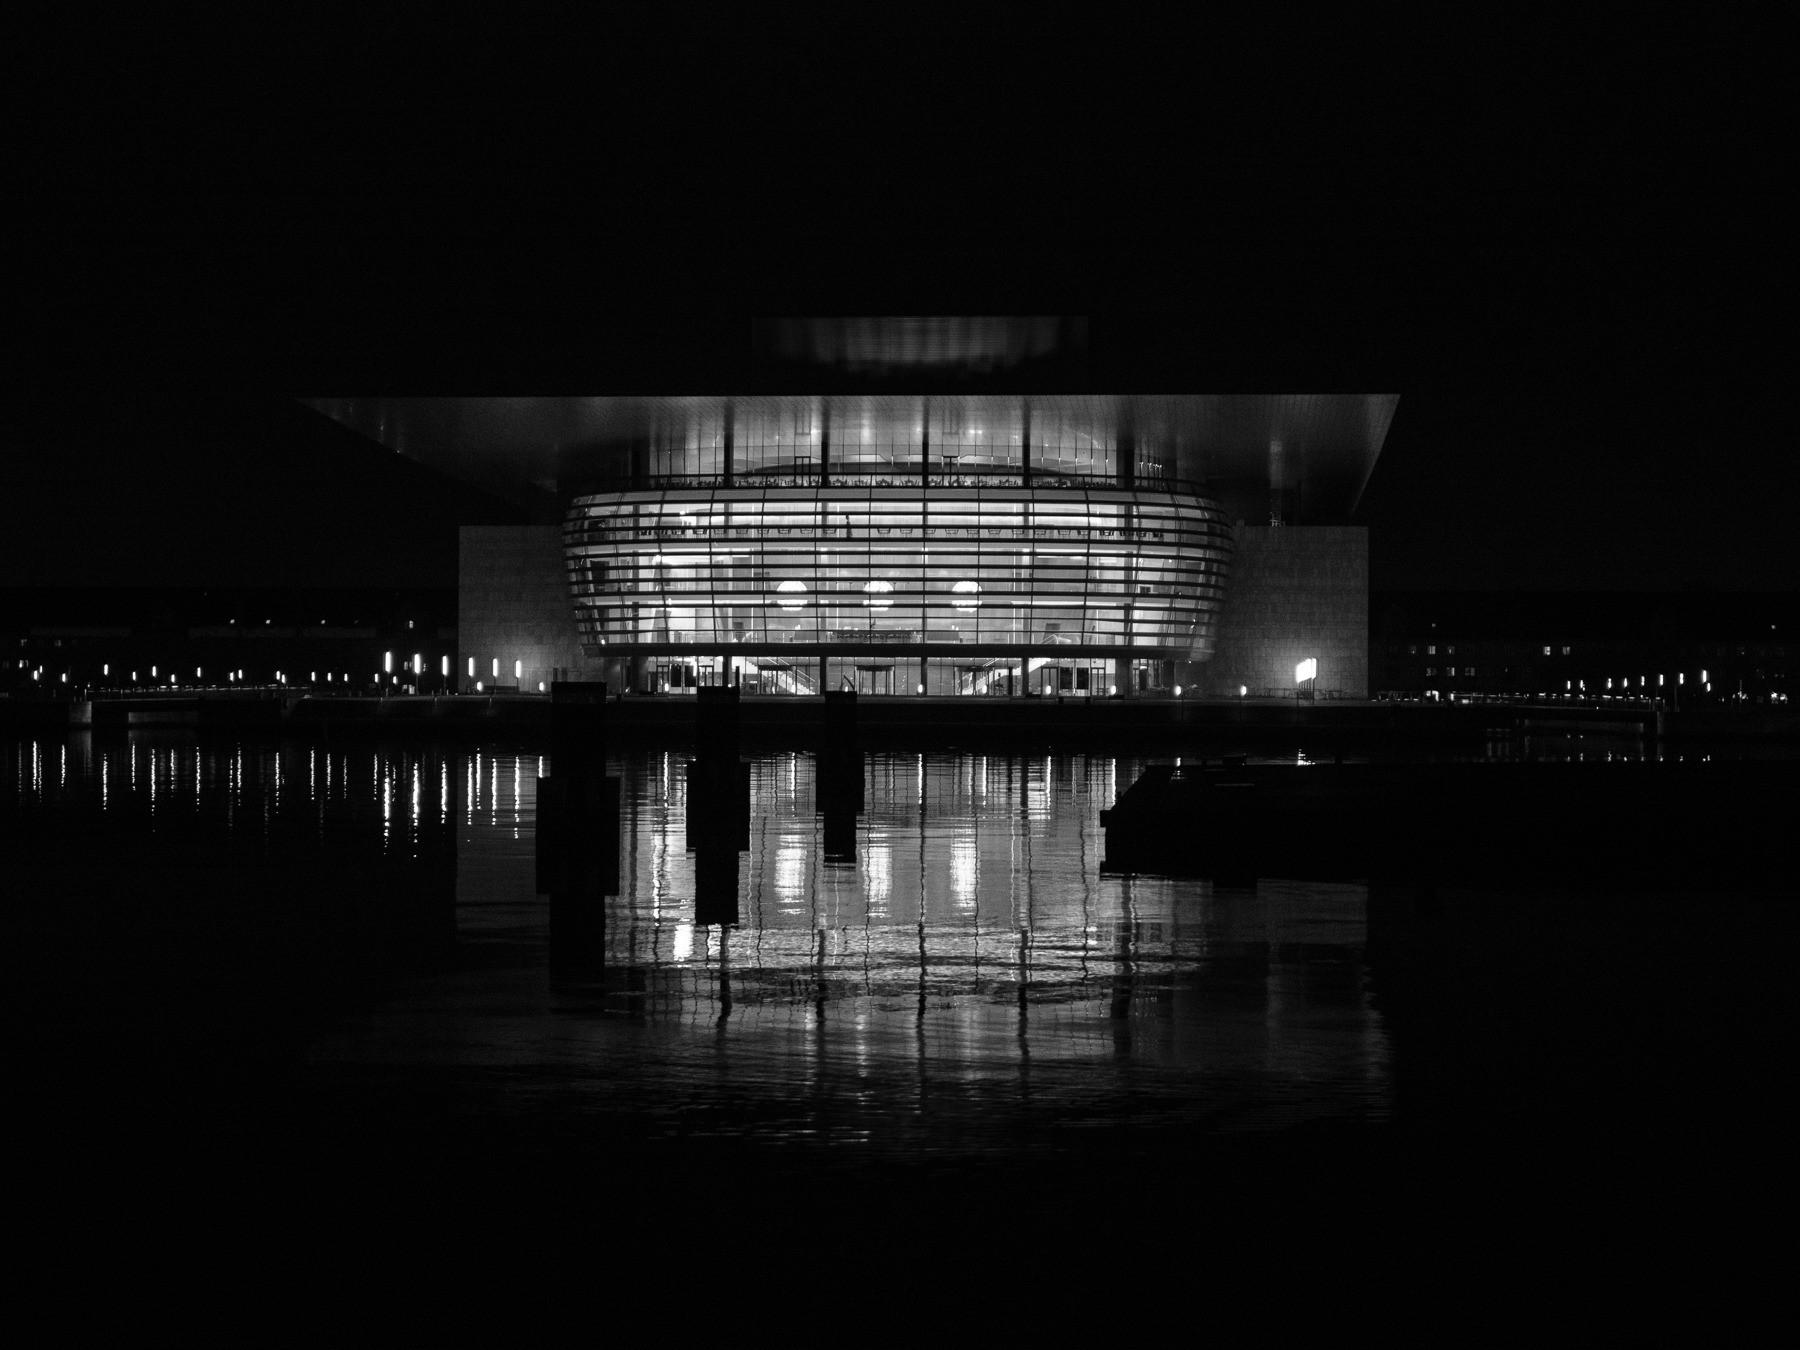 Havnefronten - Operaen